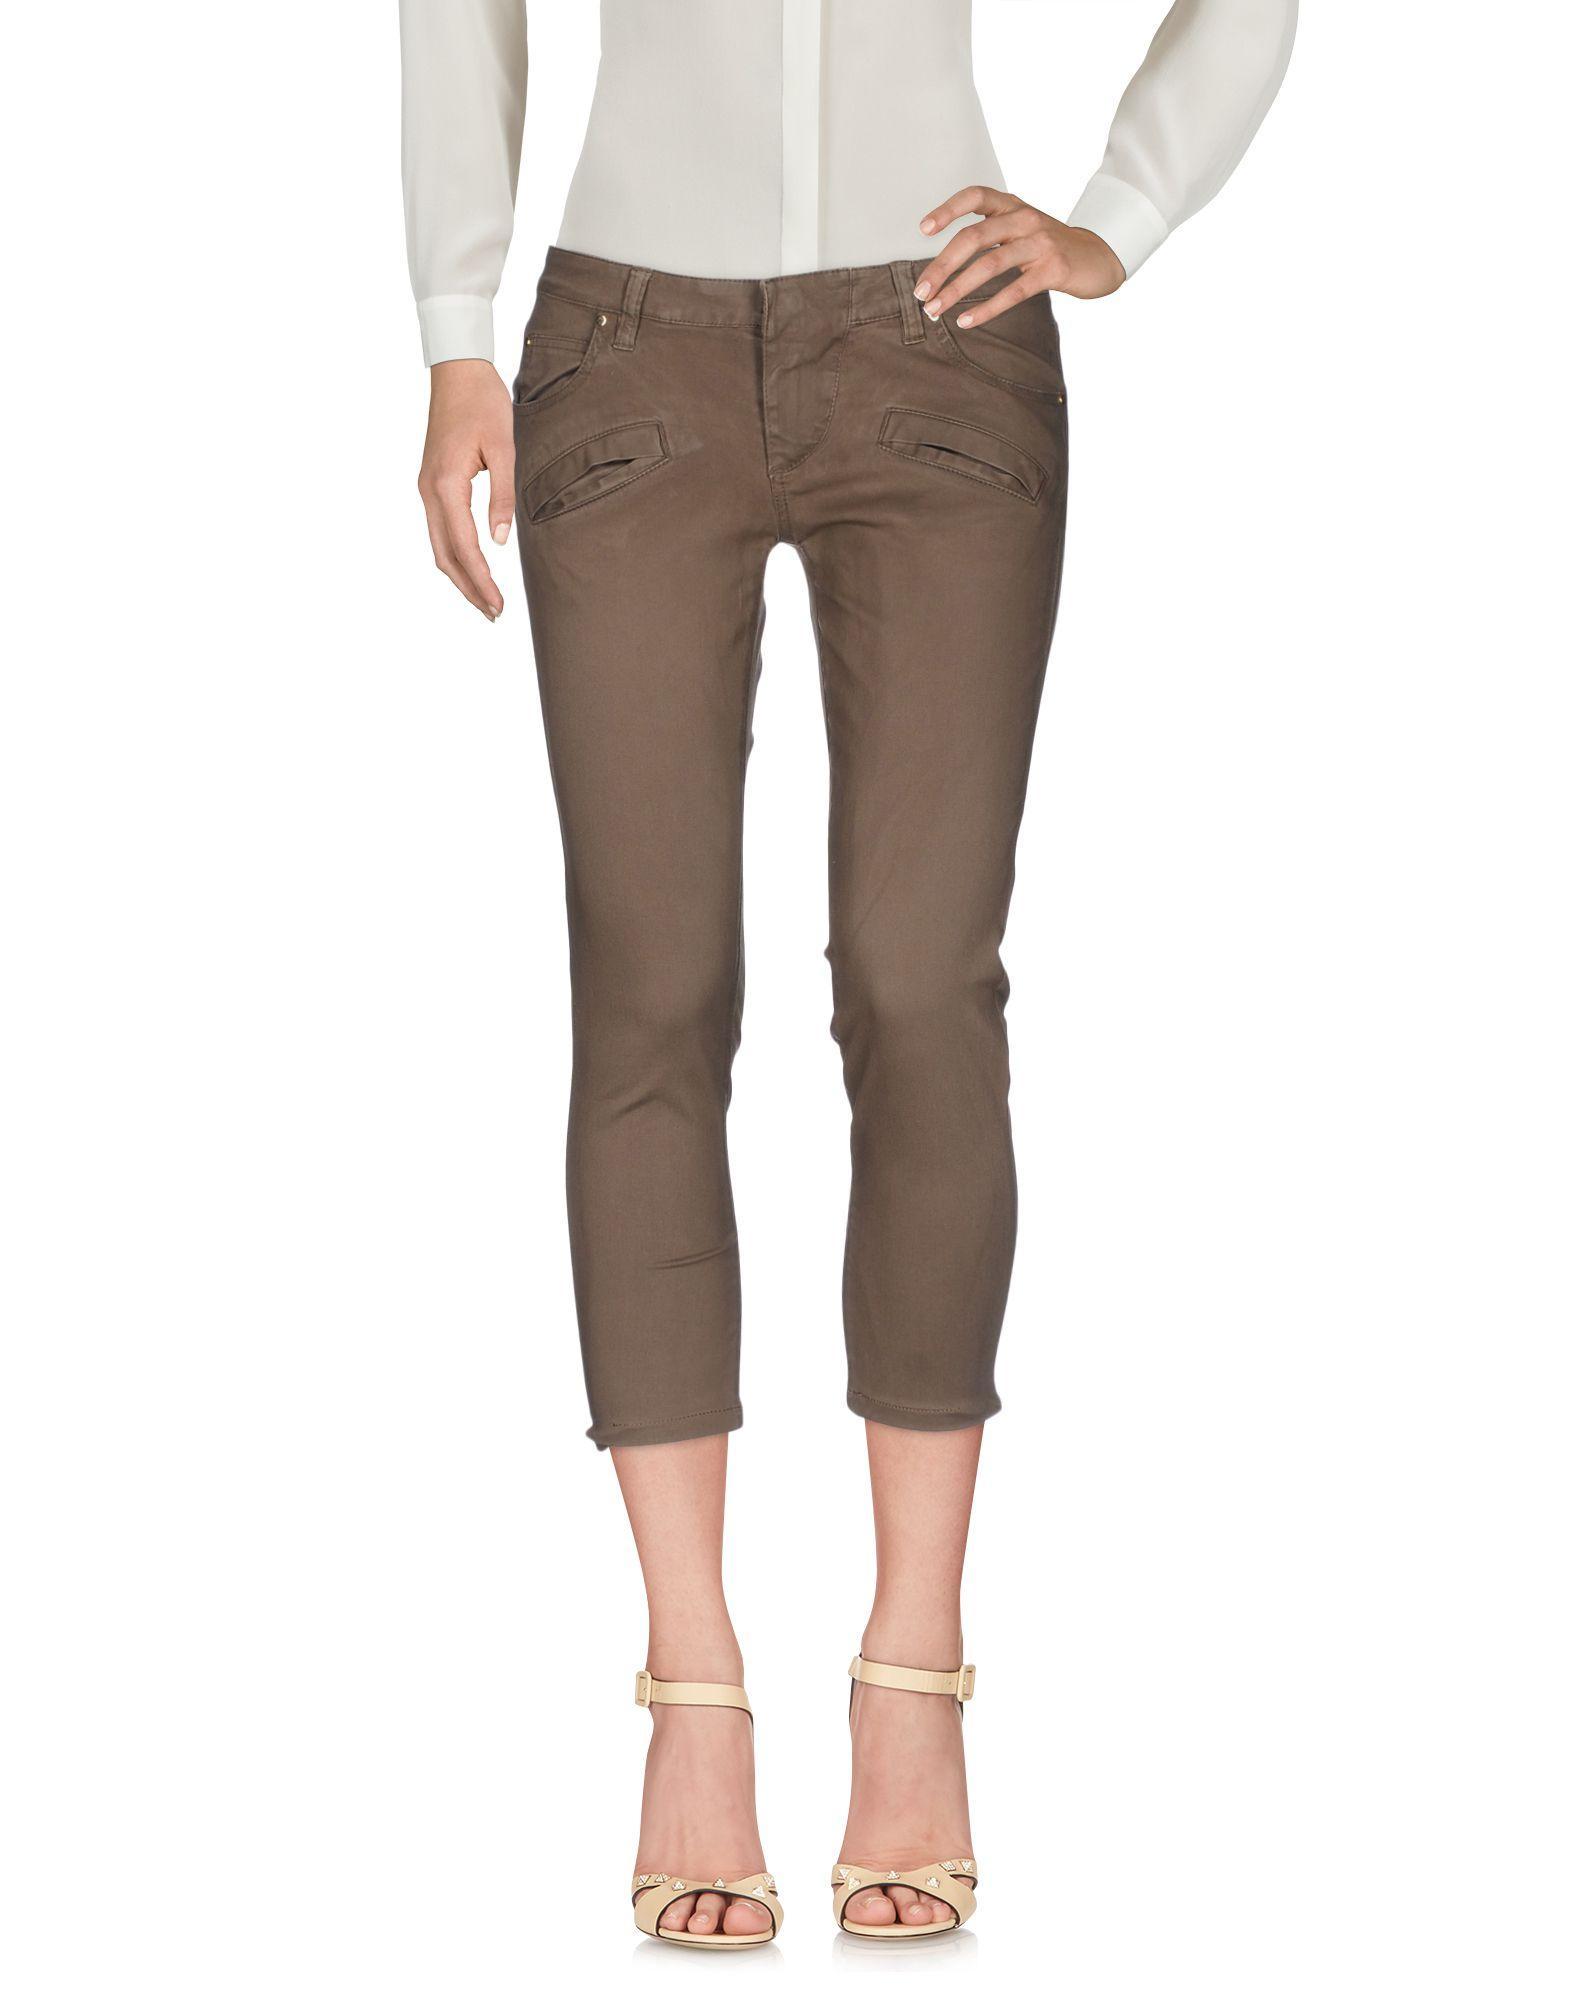 Pierre Balmain Cropped Pants & Culottes In Khaki